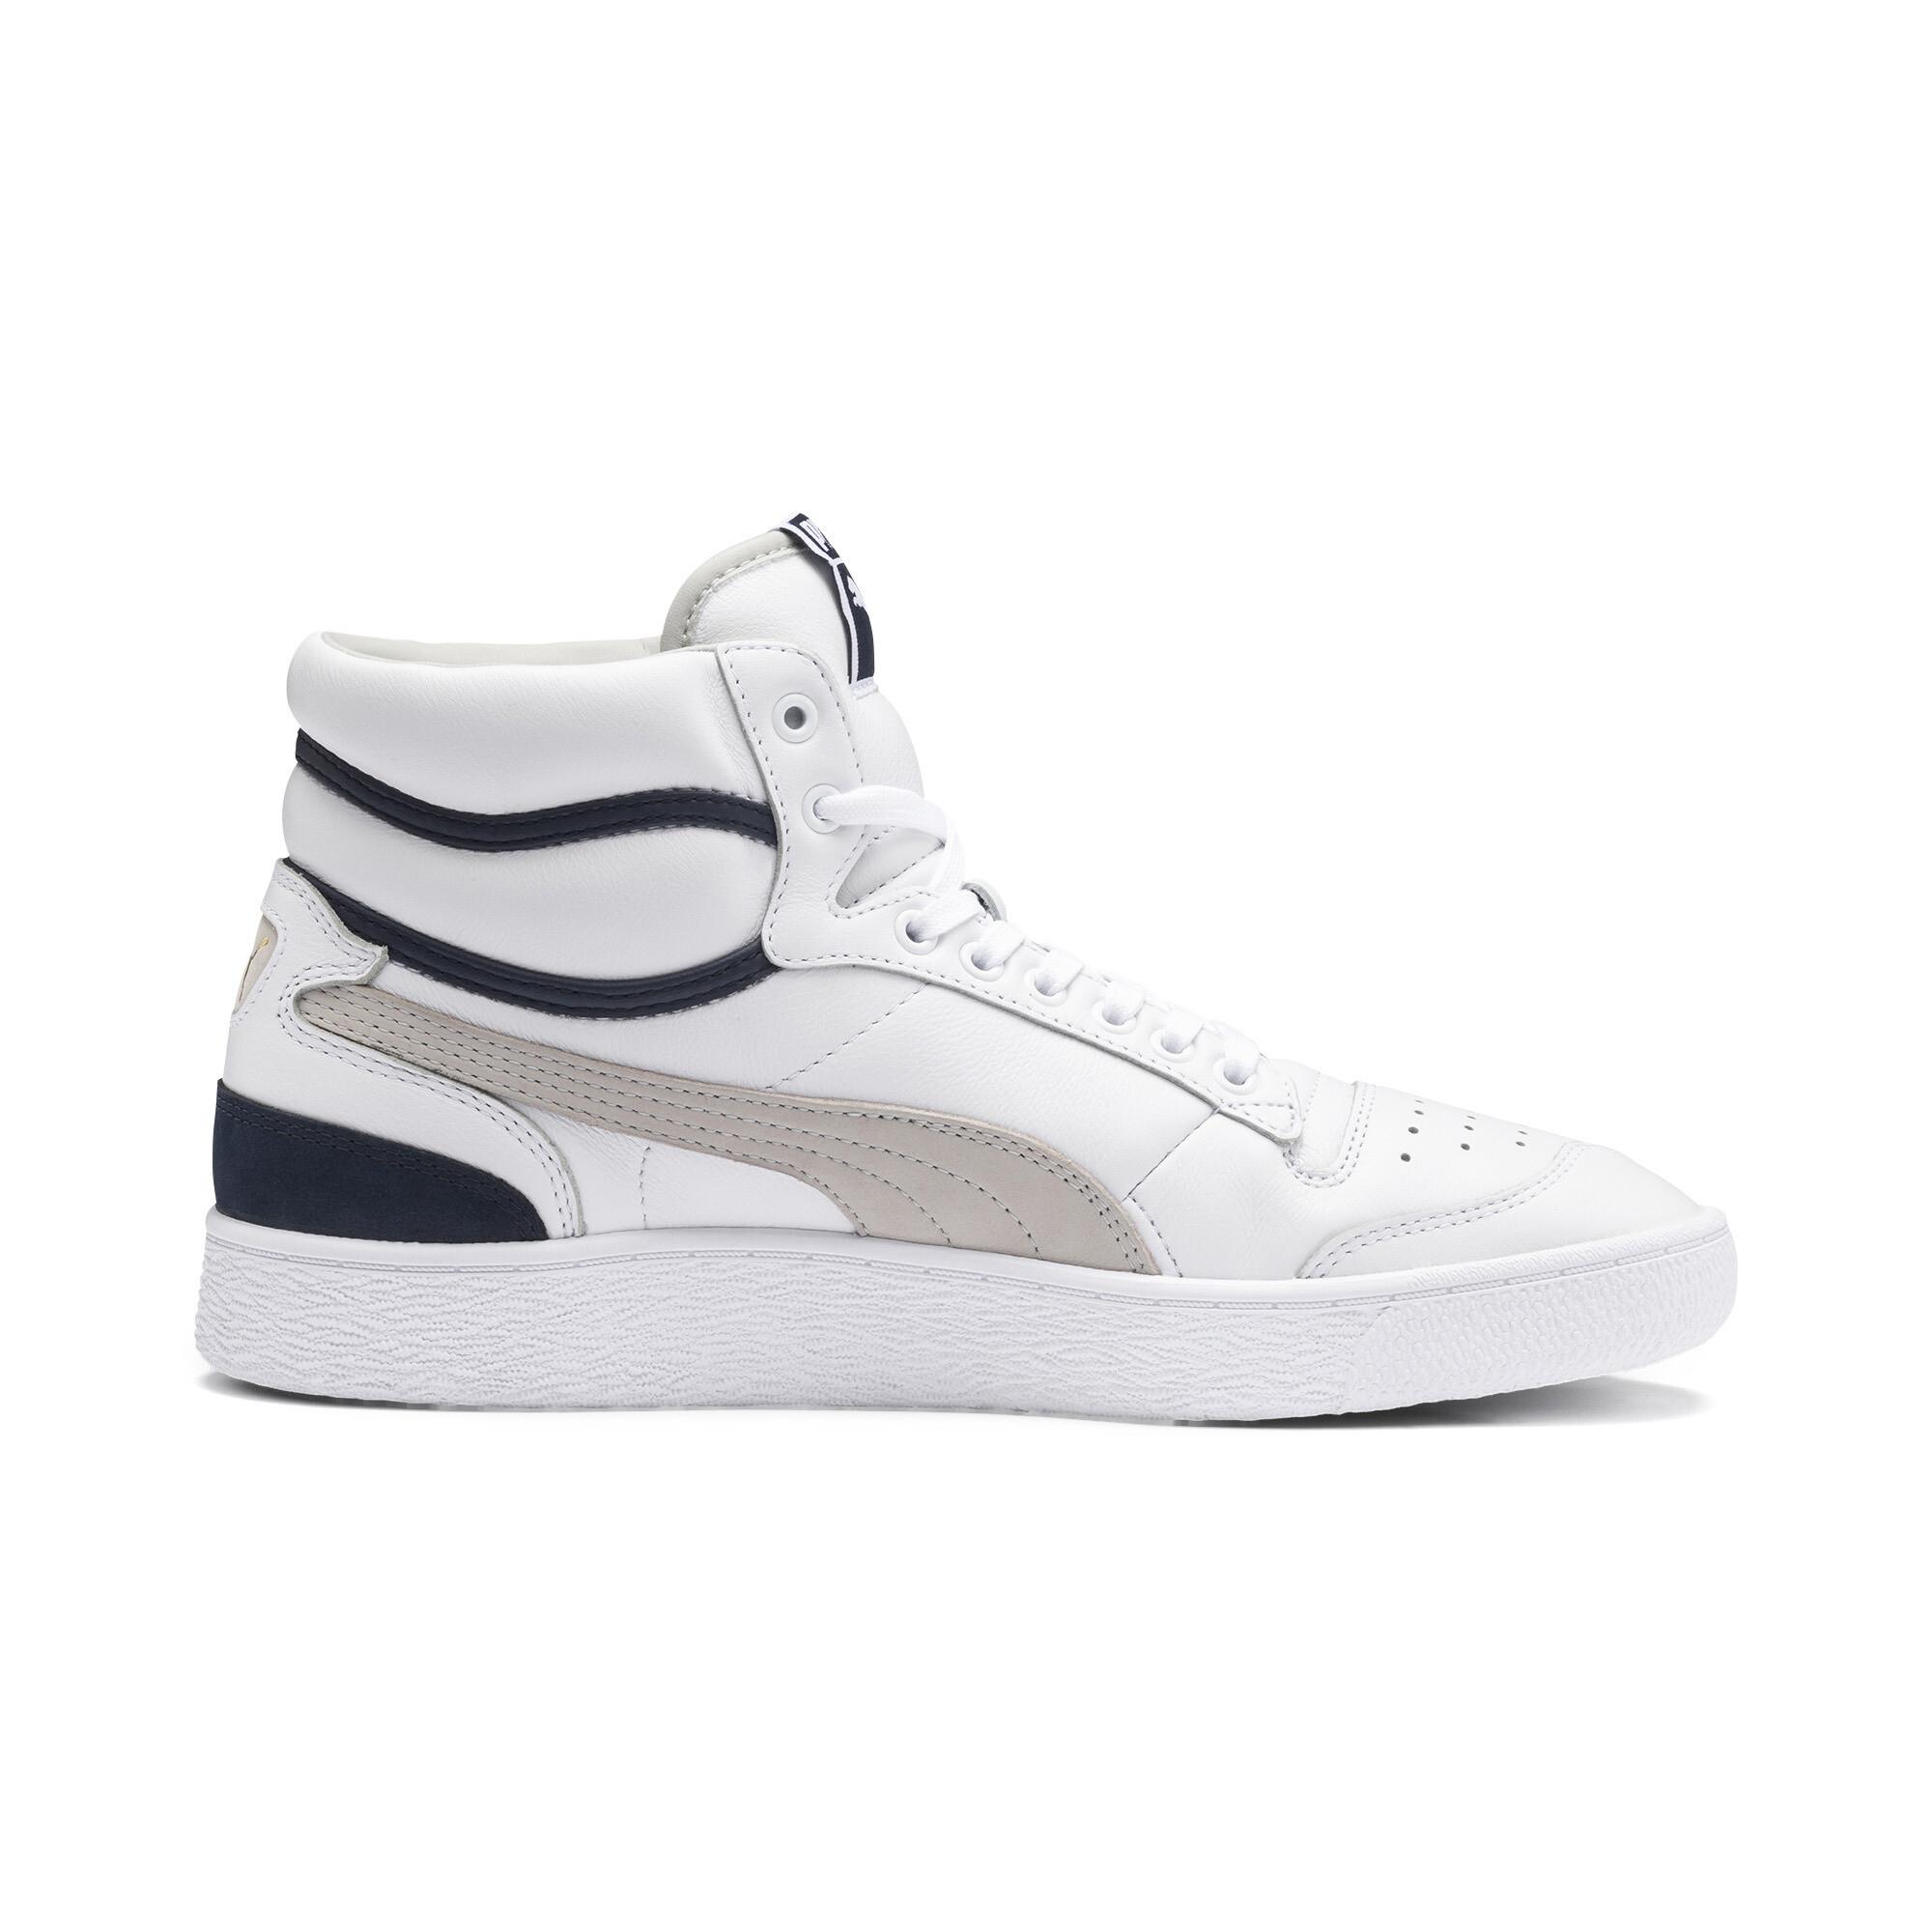 Image Puma Ralph Sampson Mid OG Sneakers #5